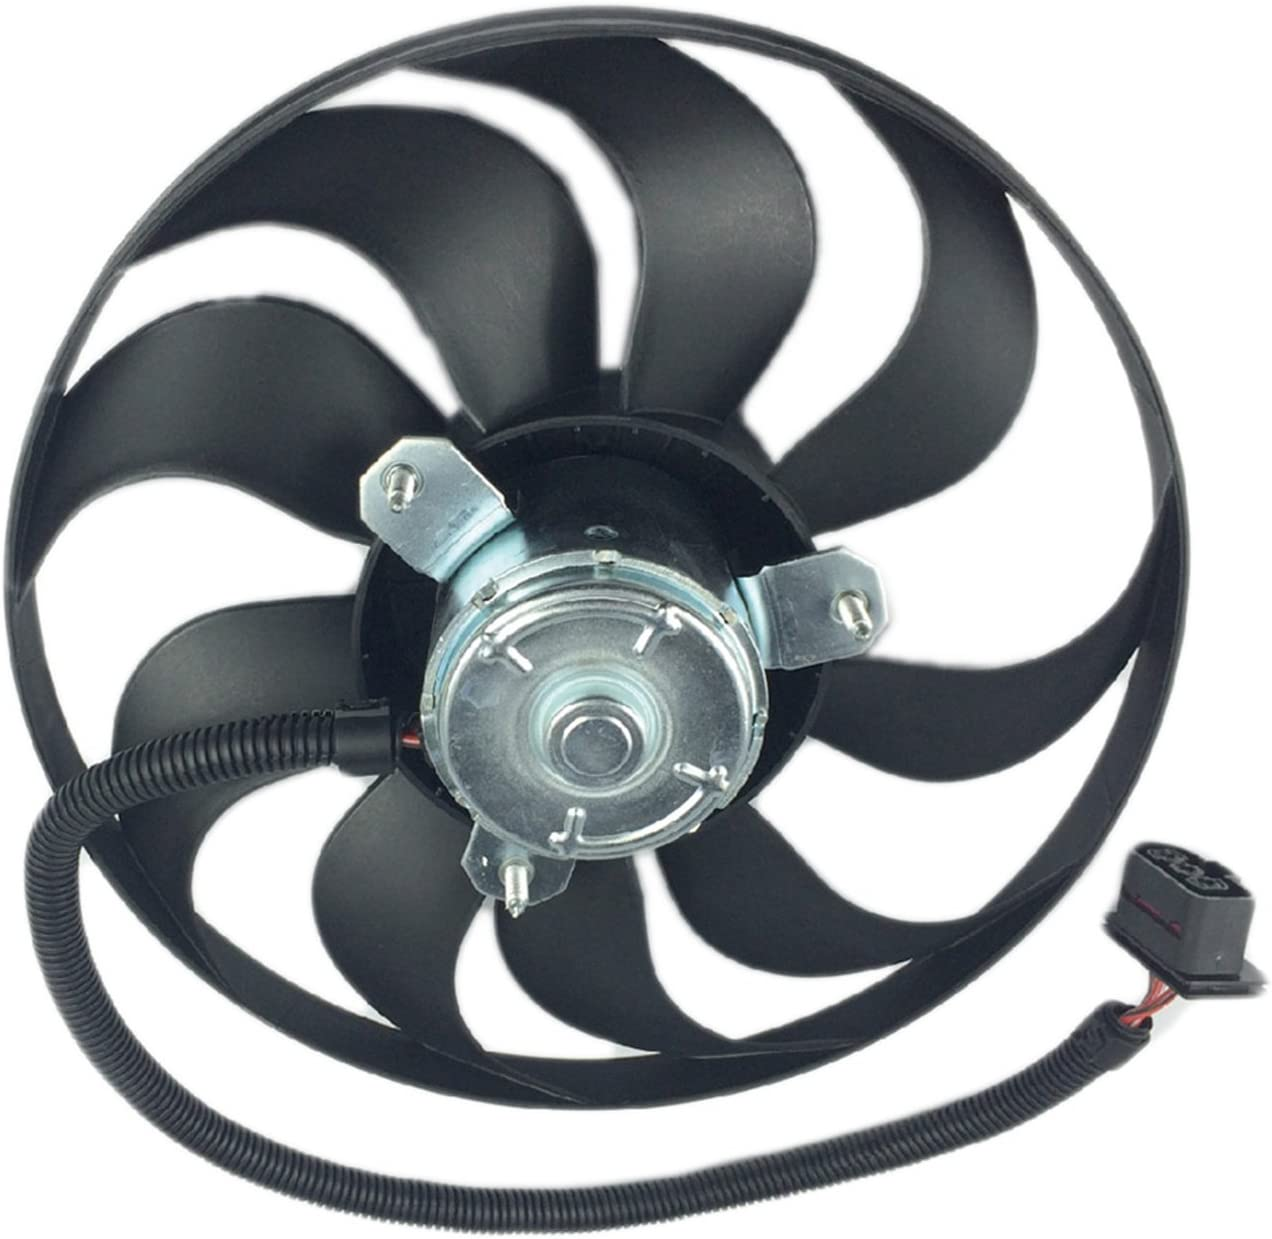 250//60W - 345mm Dia Left 6X0-959-455F MTC 4429 for Audi // Volkswagen Models MTC 4429 // 6X0-959-455F Engine Cooling Fan Motor